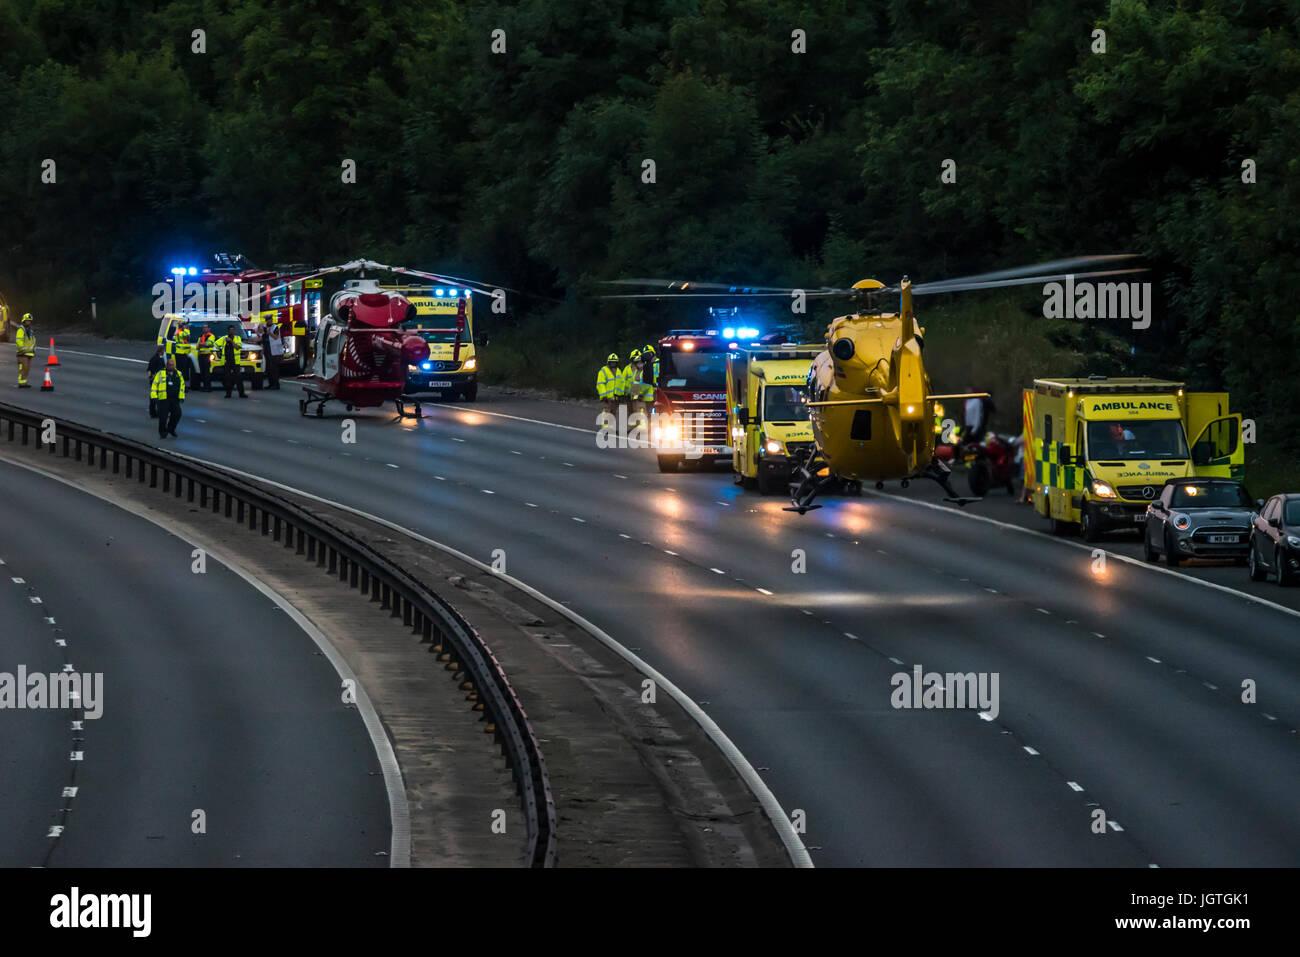 accident-closed-m11-bishops-stortford-harlow-essex-three-people-taken-JGTGK1.jpg